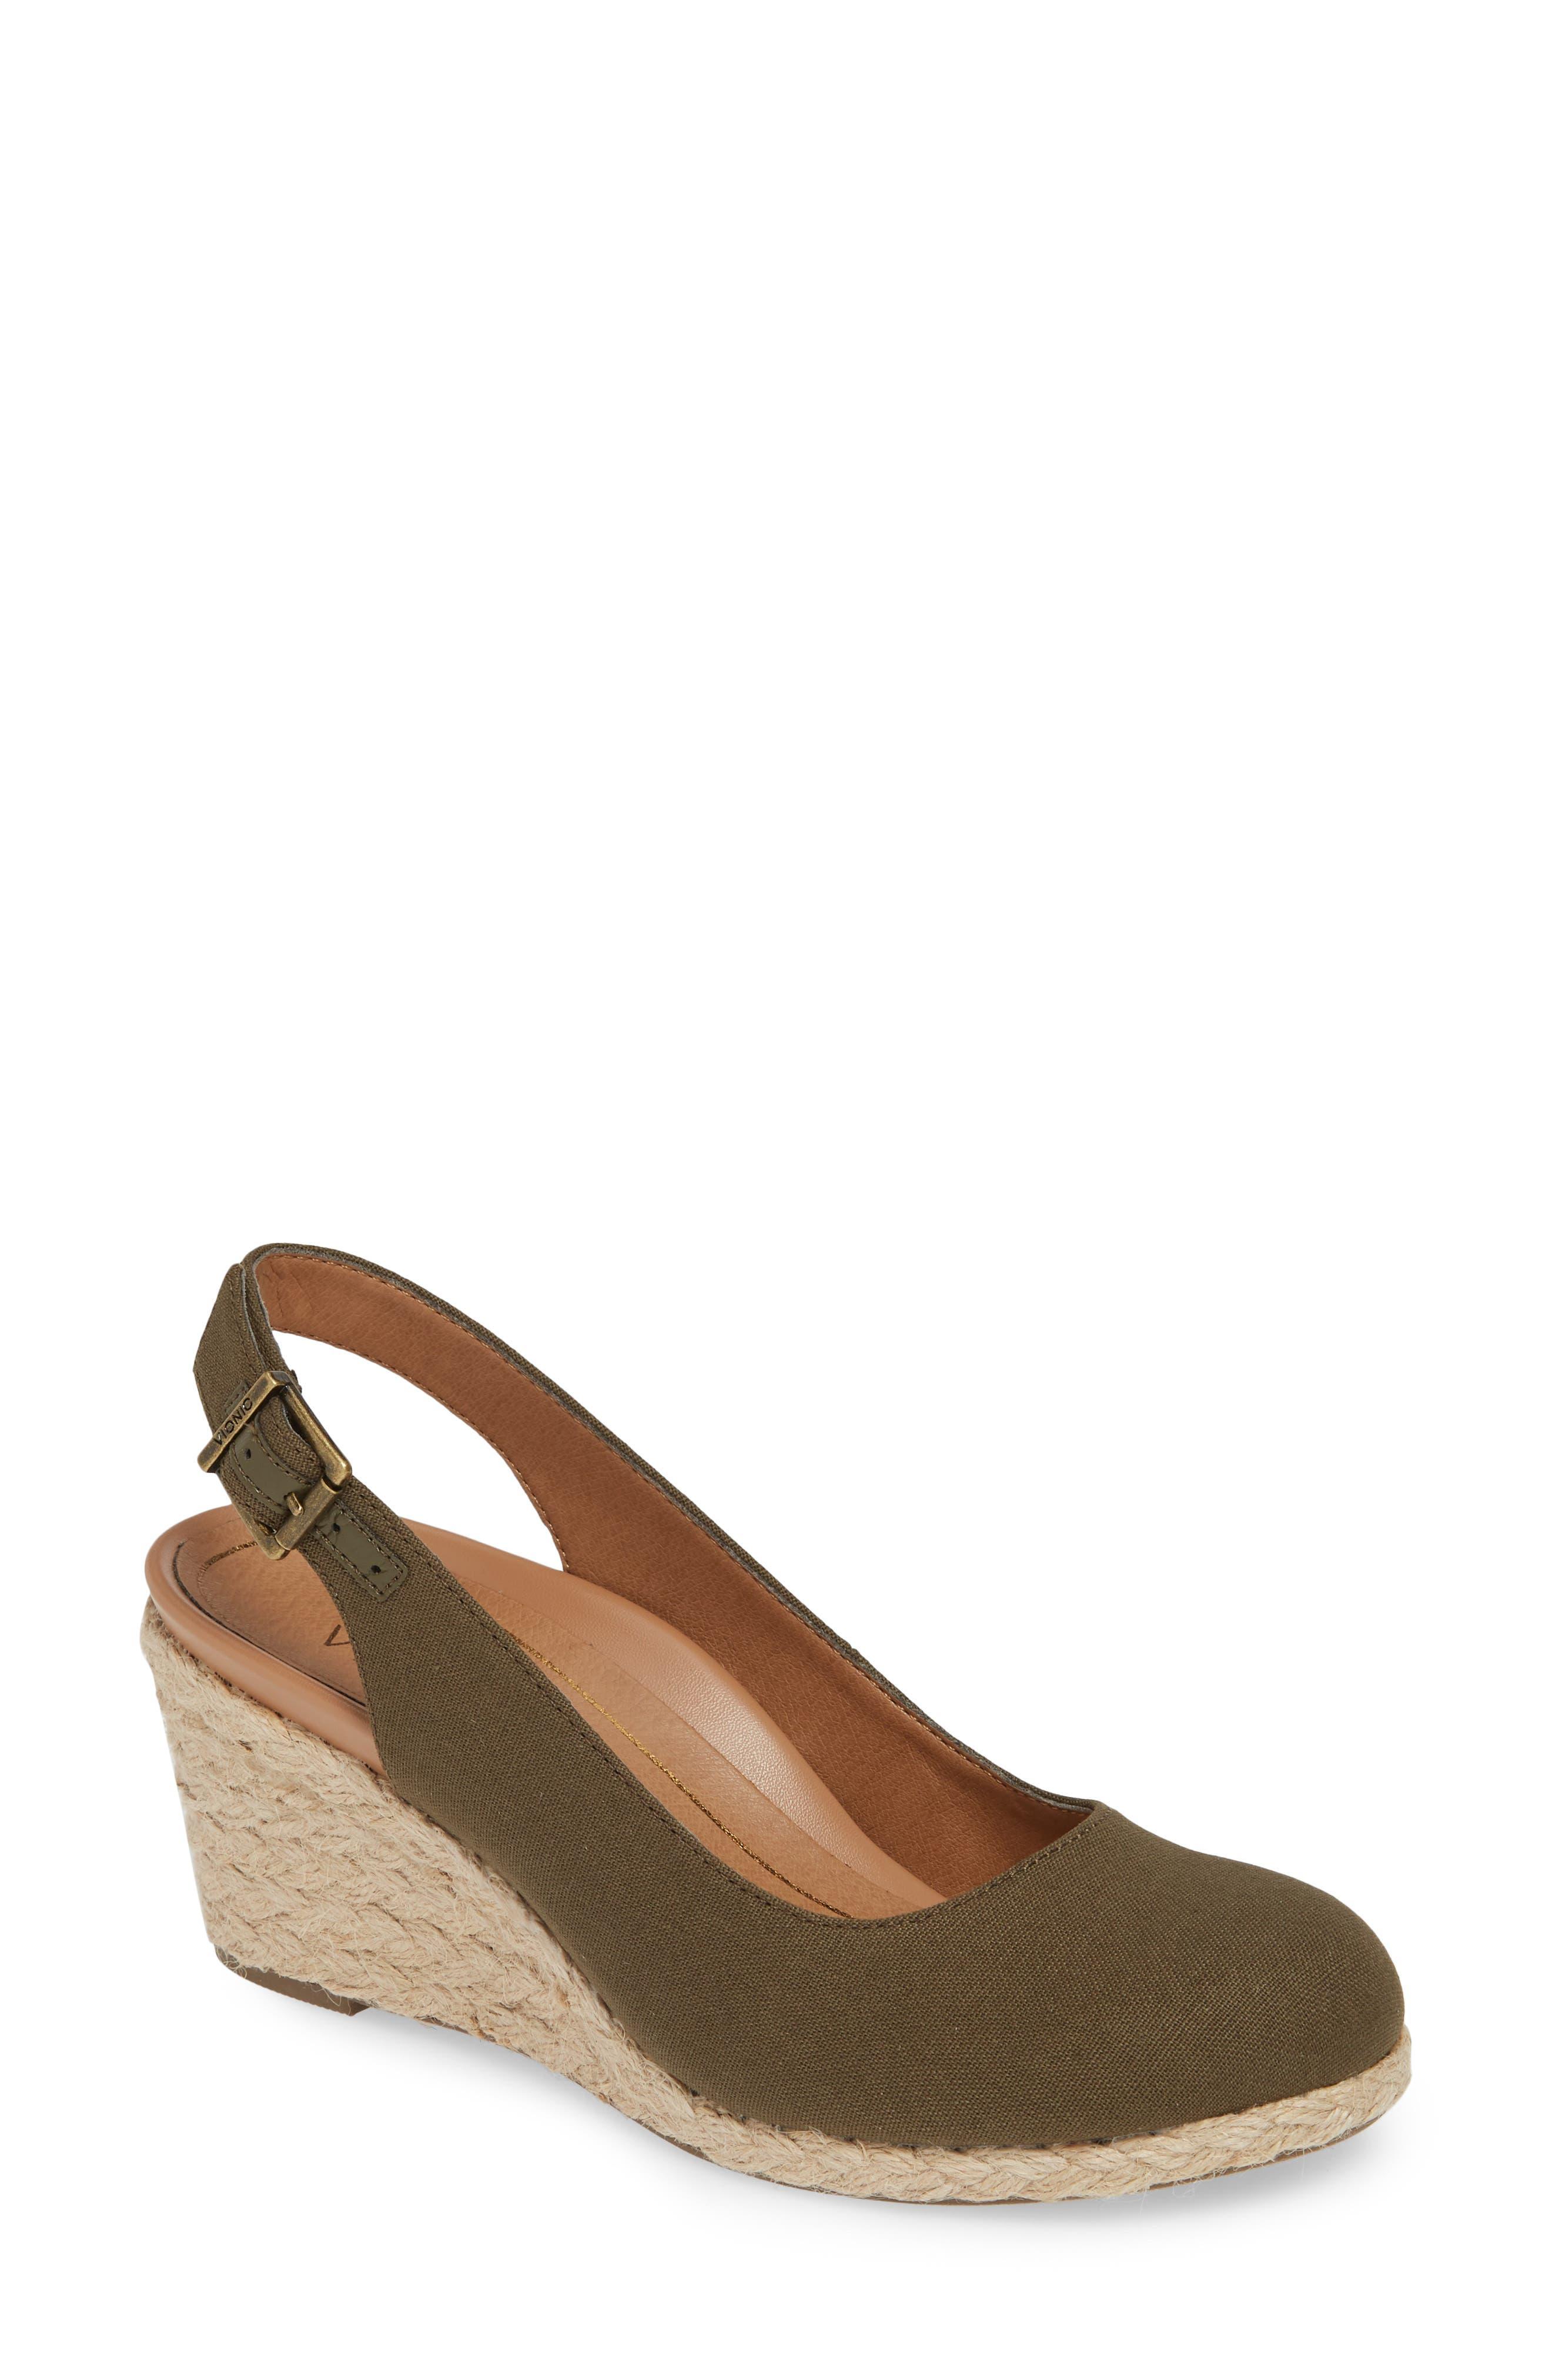 93b032fbd694 Vionic Coralina Orthaheel Espadrille Wedge Slingback Sandal